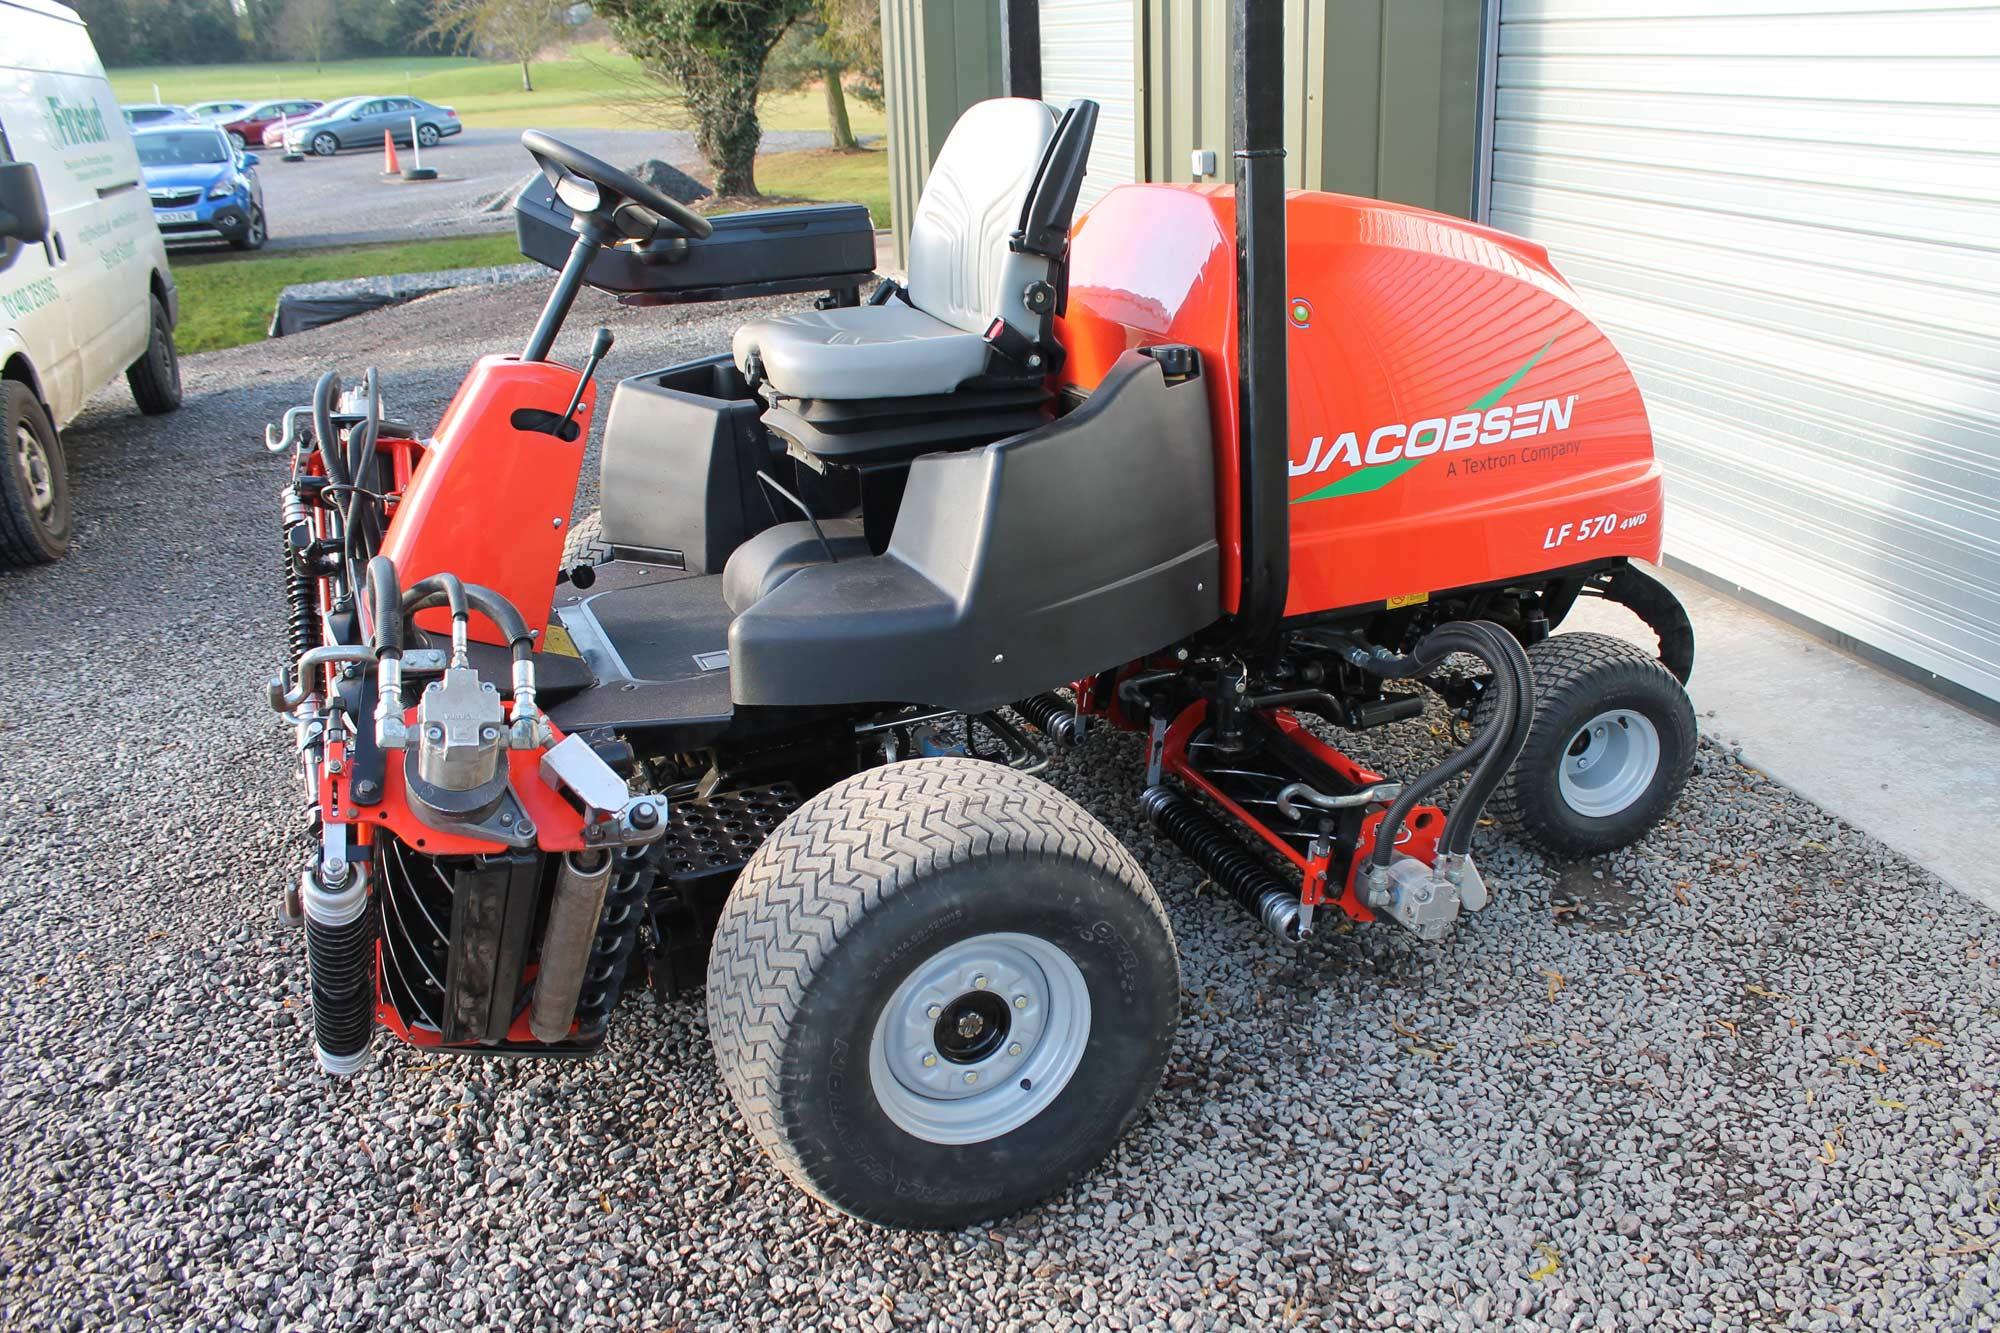 Jacobsen LF570 Cylinder Mower